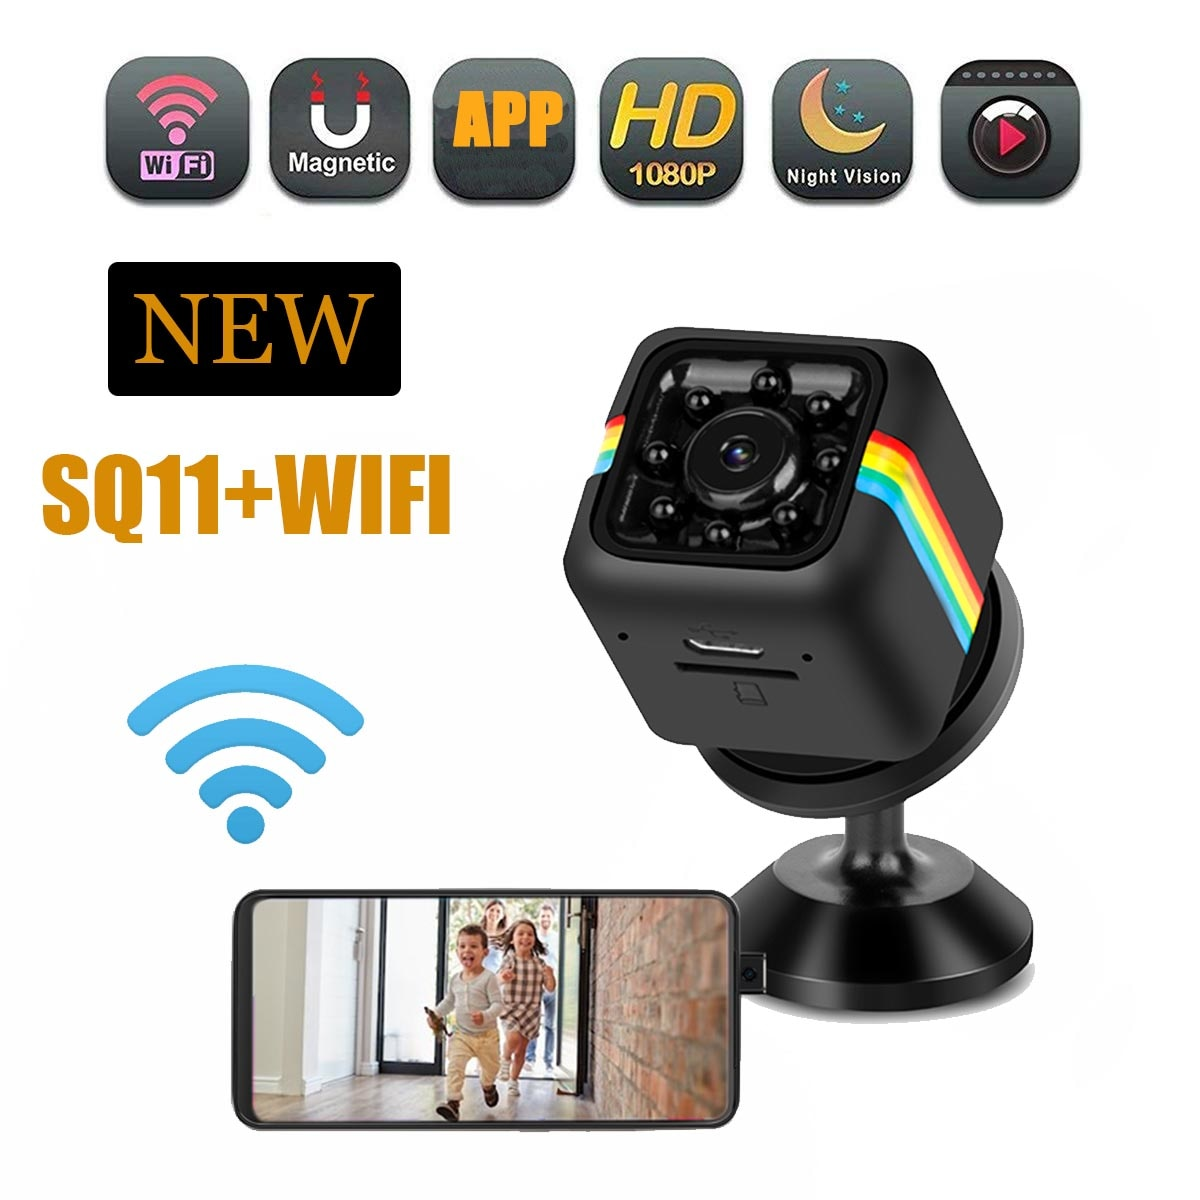 JOZUZE واي فاي كاميرا صغيرة HD 1080P DVR للرؤية الليلية كاميرا لاسلكية كام كاميرا دقيقة الرياضة فيديو رقمي صغير جدا سرية كام SQ11